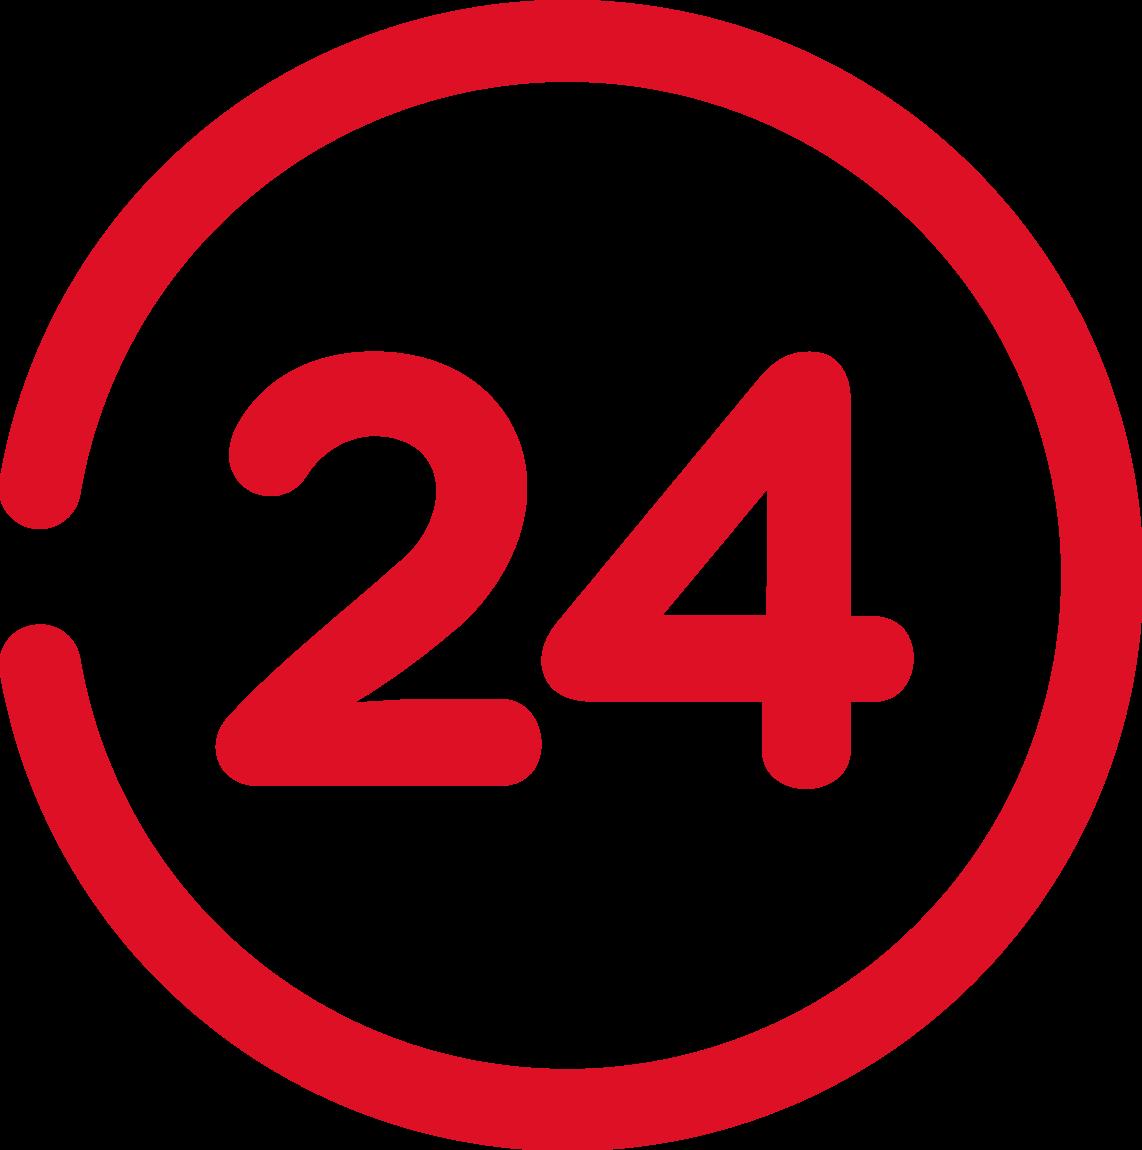 File:Logotipo de 24 Horas TVN.png - Wikimedia Commons